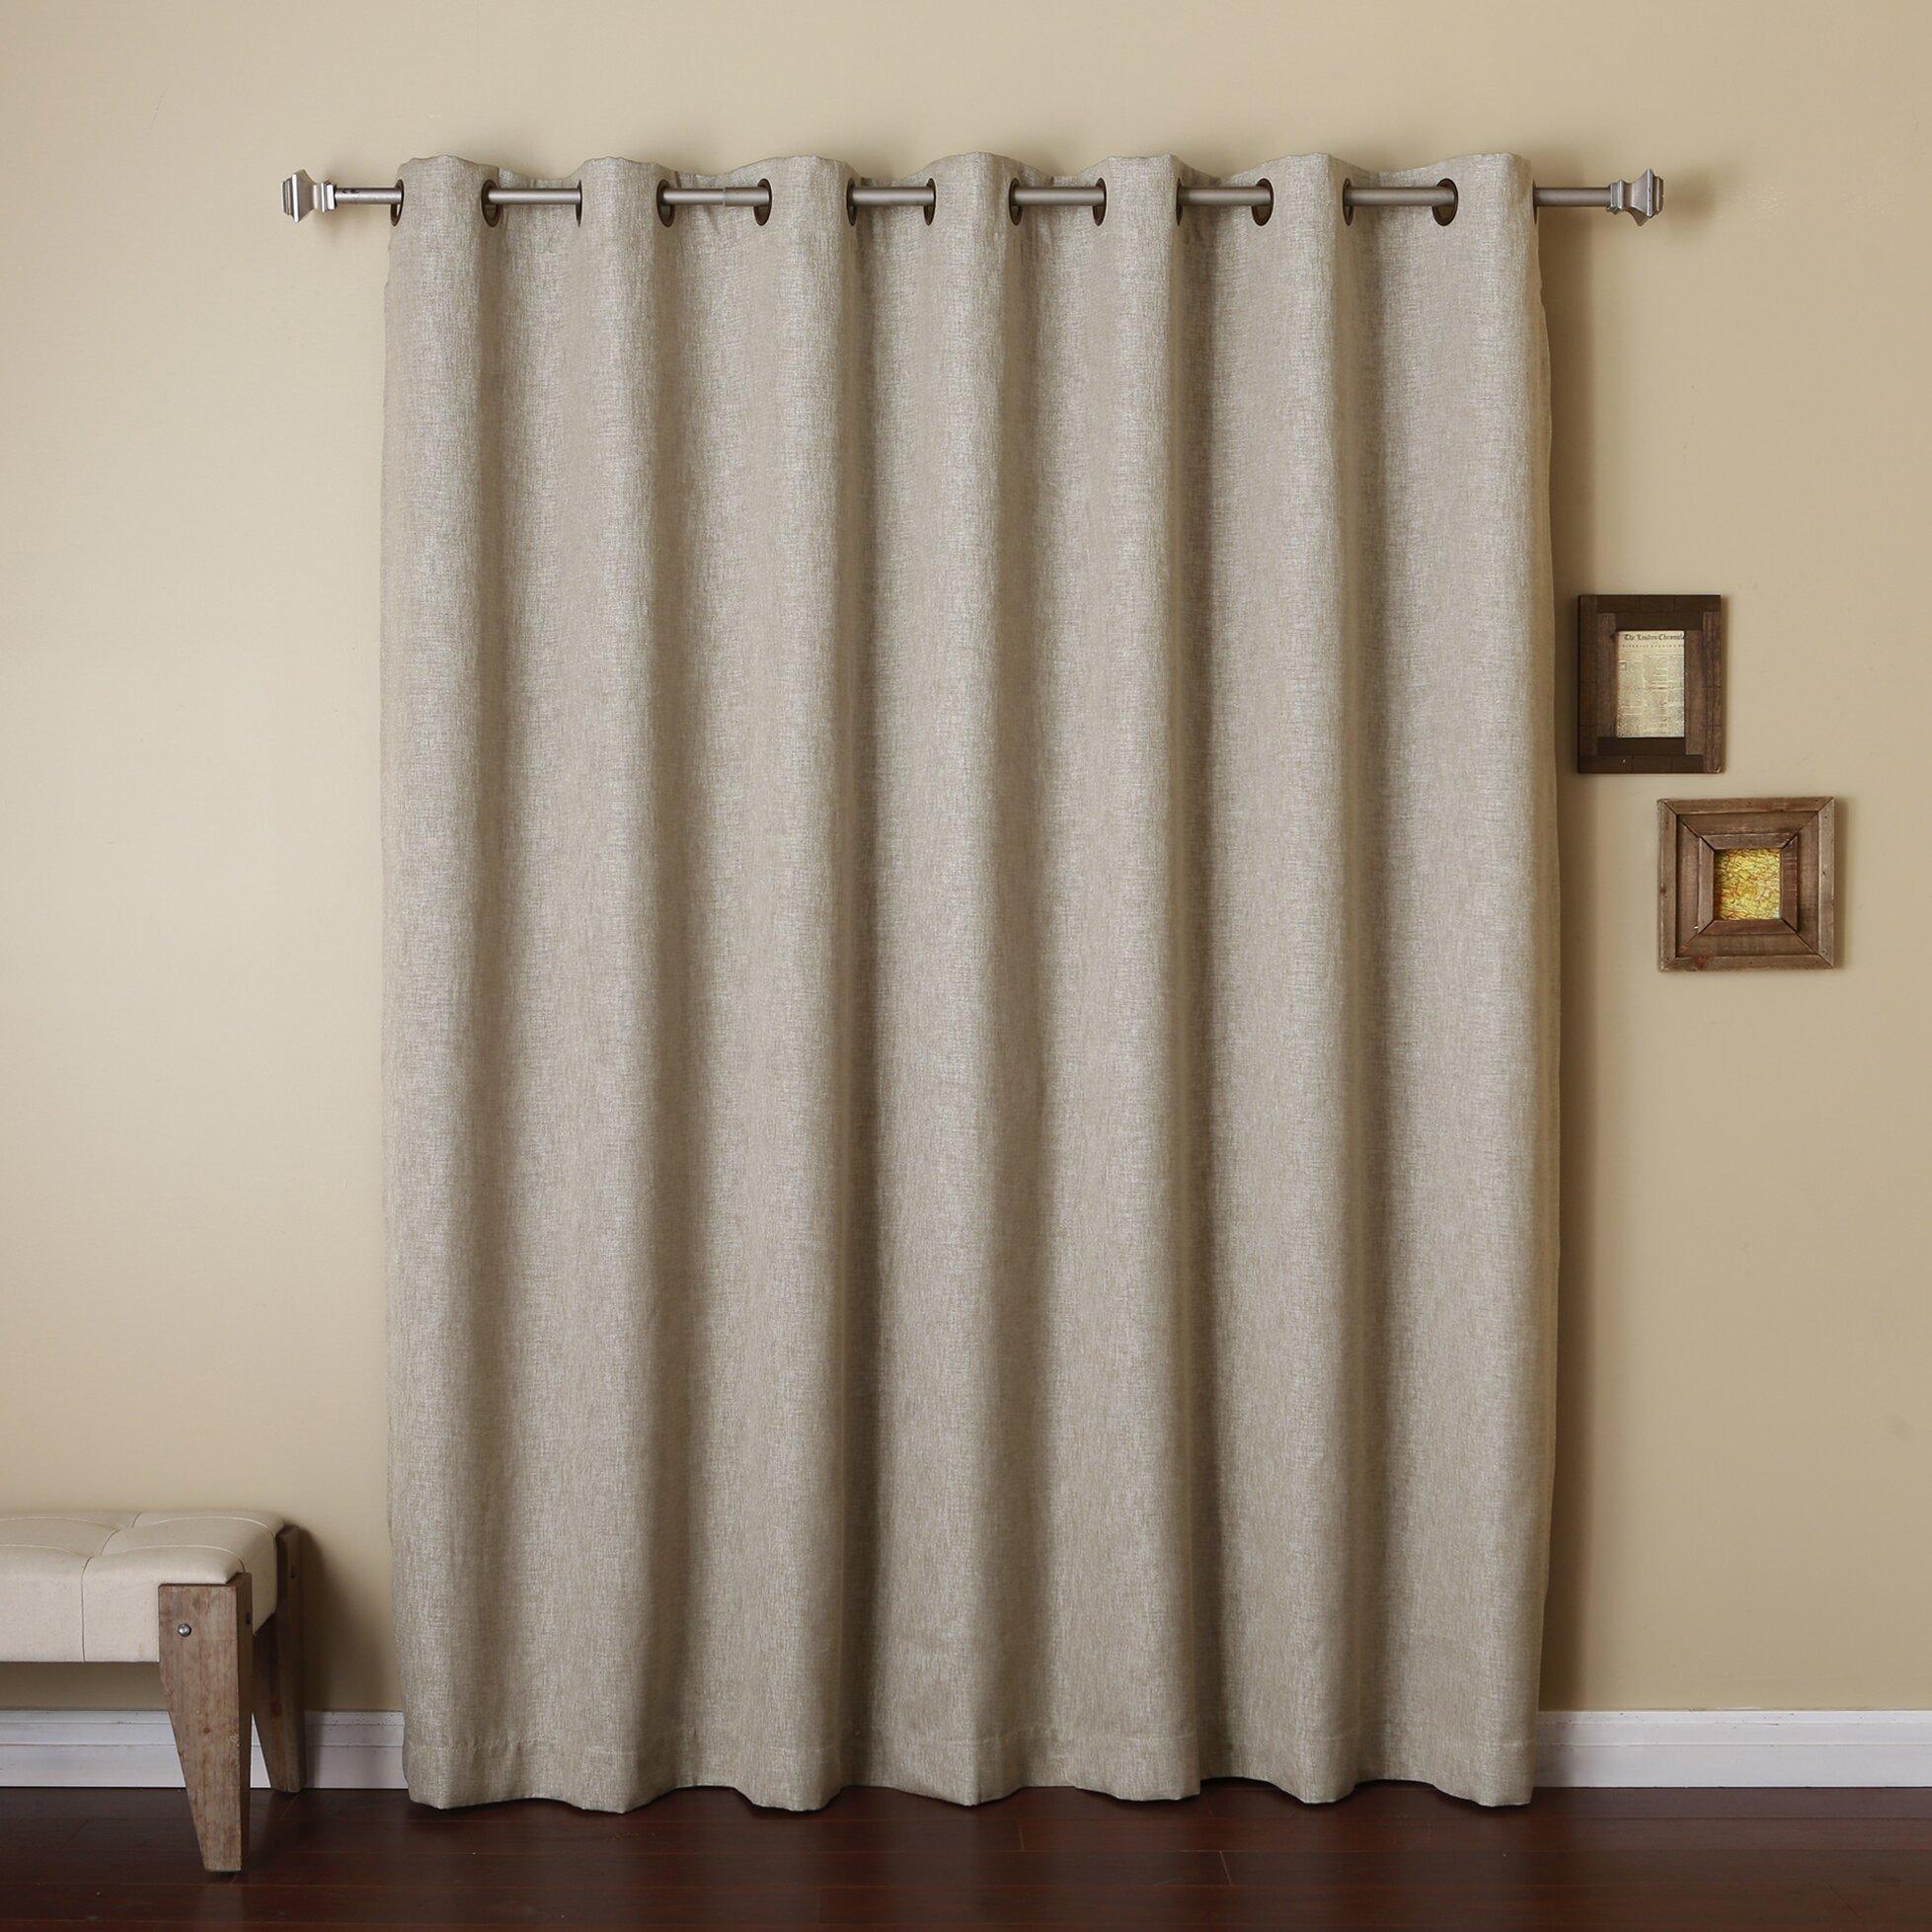 Décor Window Treatments Curtains & Drapes Best Home Fashion, Inc. SKU ...